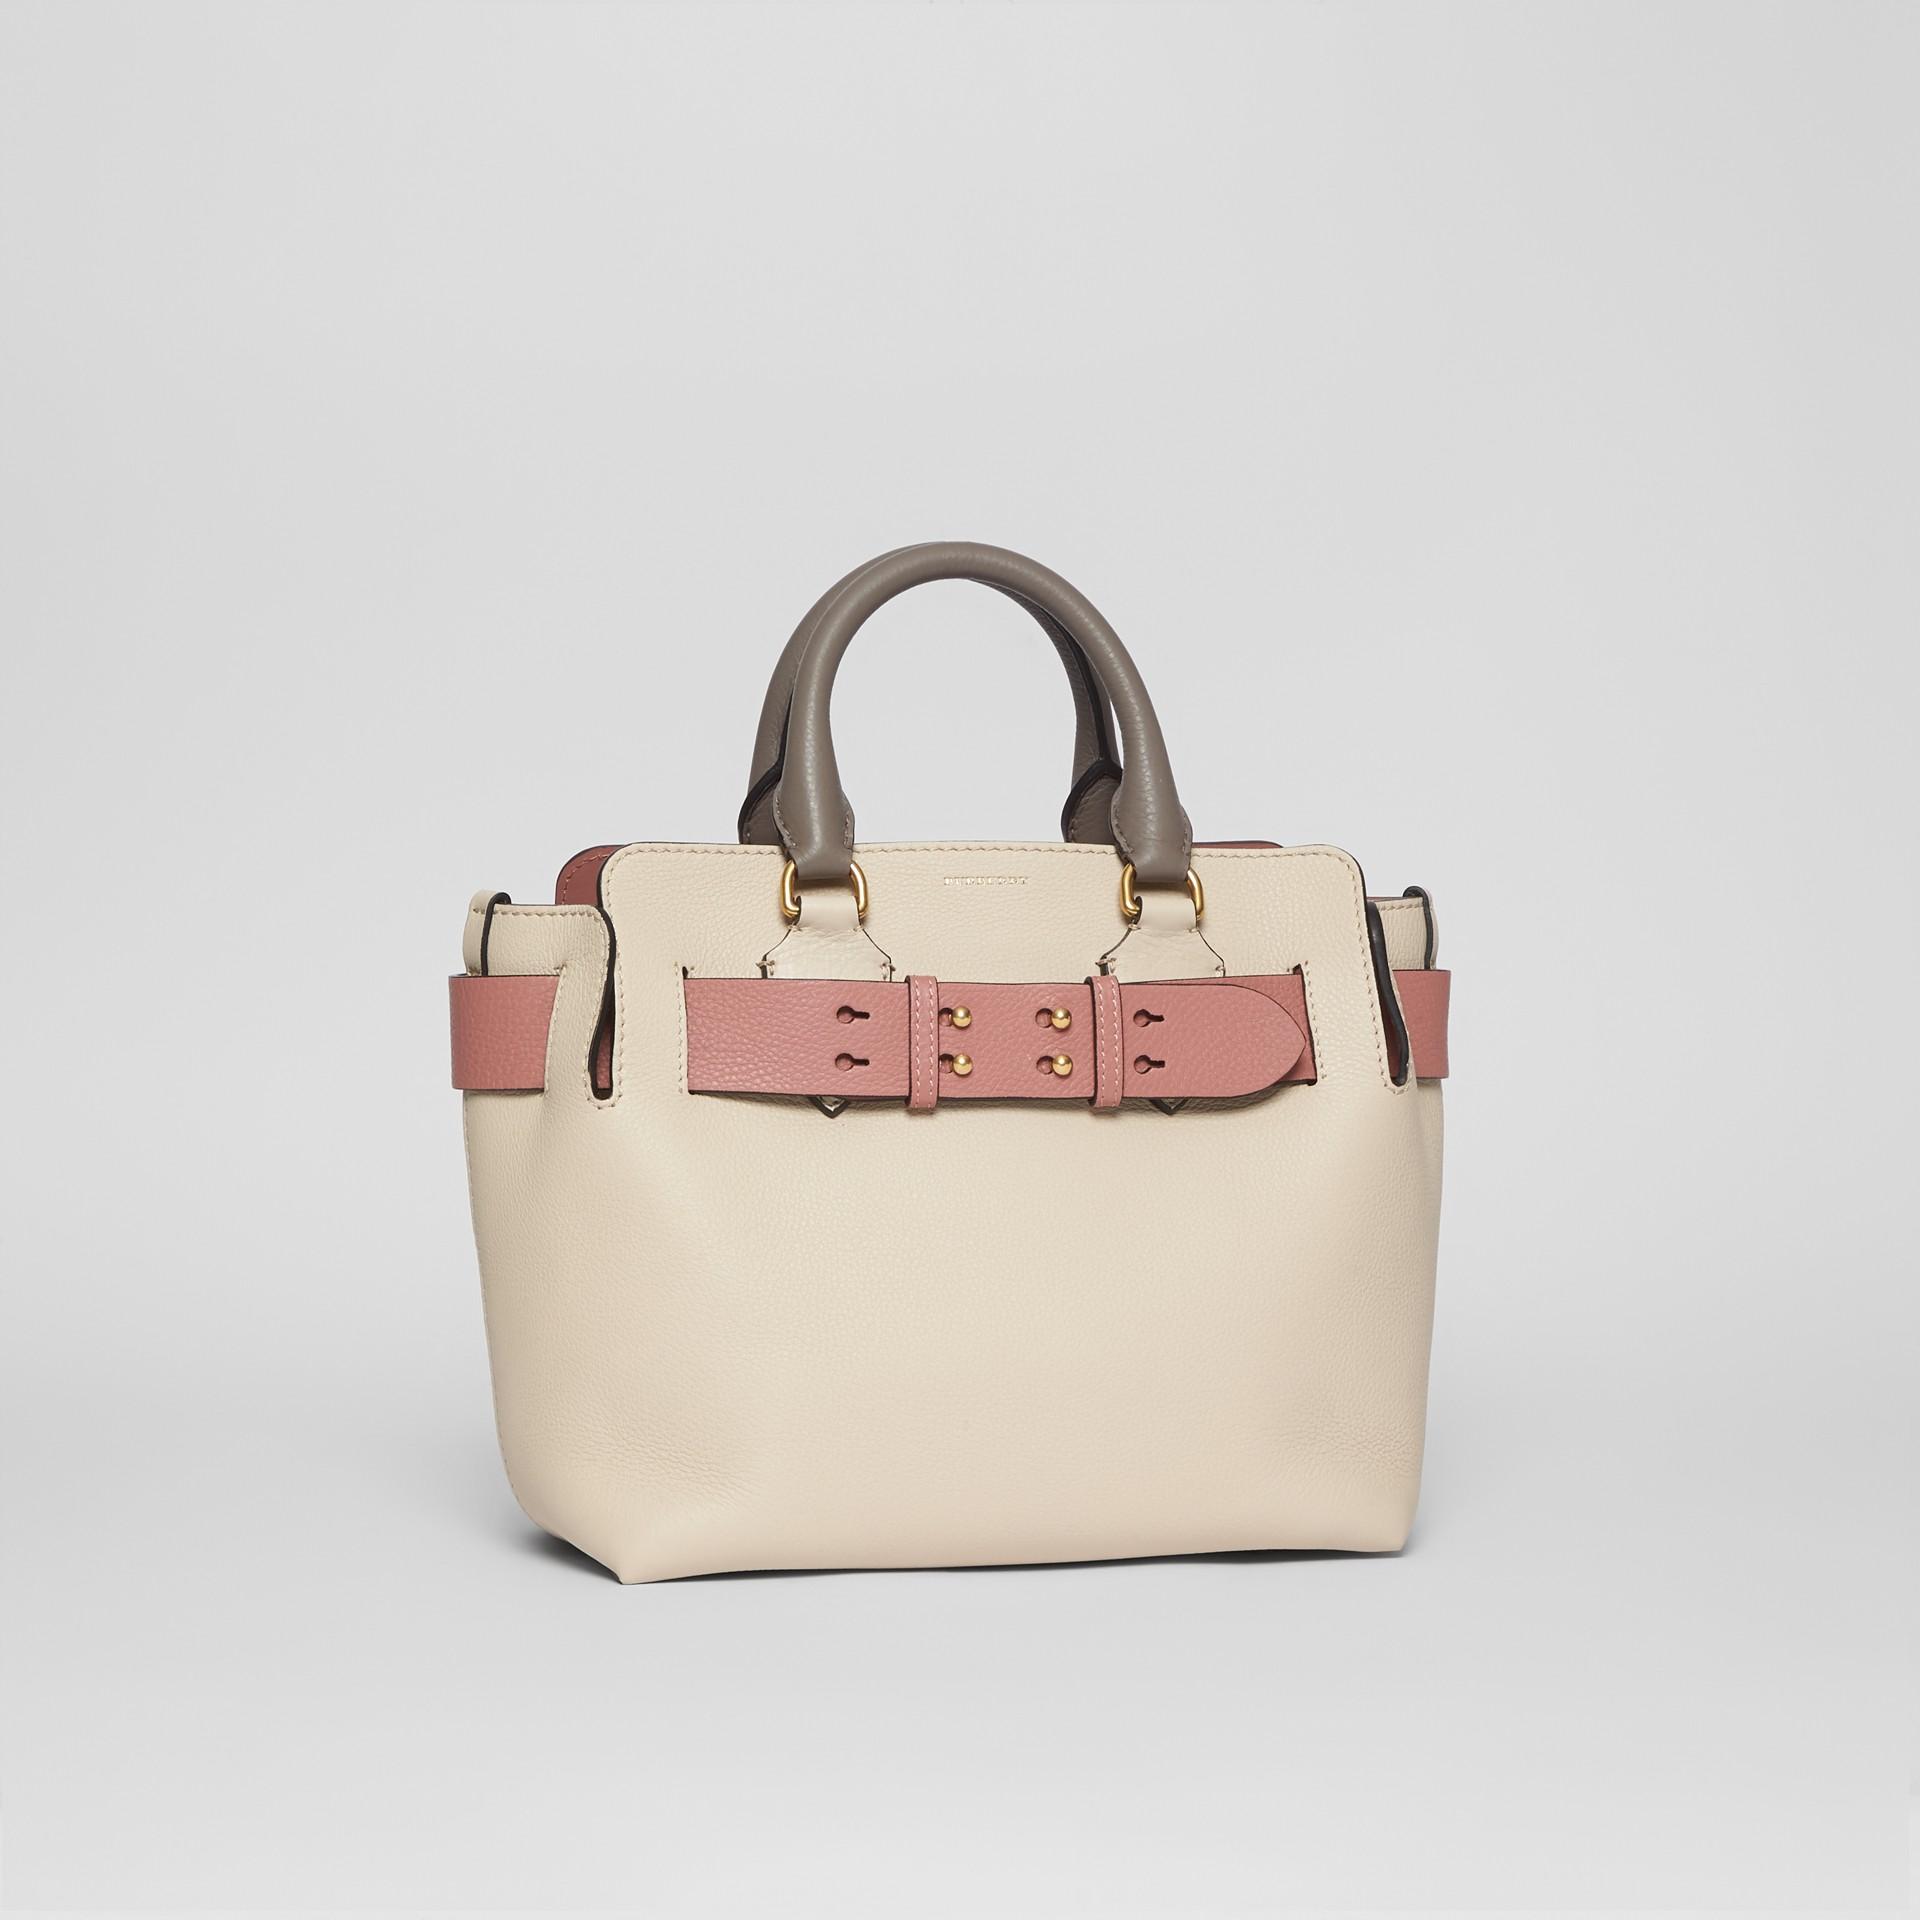 The Small Belt Bag aus Leder in Dreitonoptik (Kalksteinfarben/altrosenfarben) - Damen | Burberry - Galerie-Bild 6